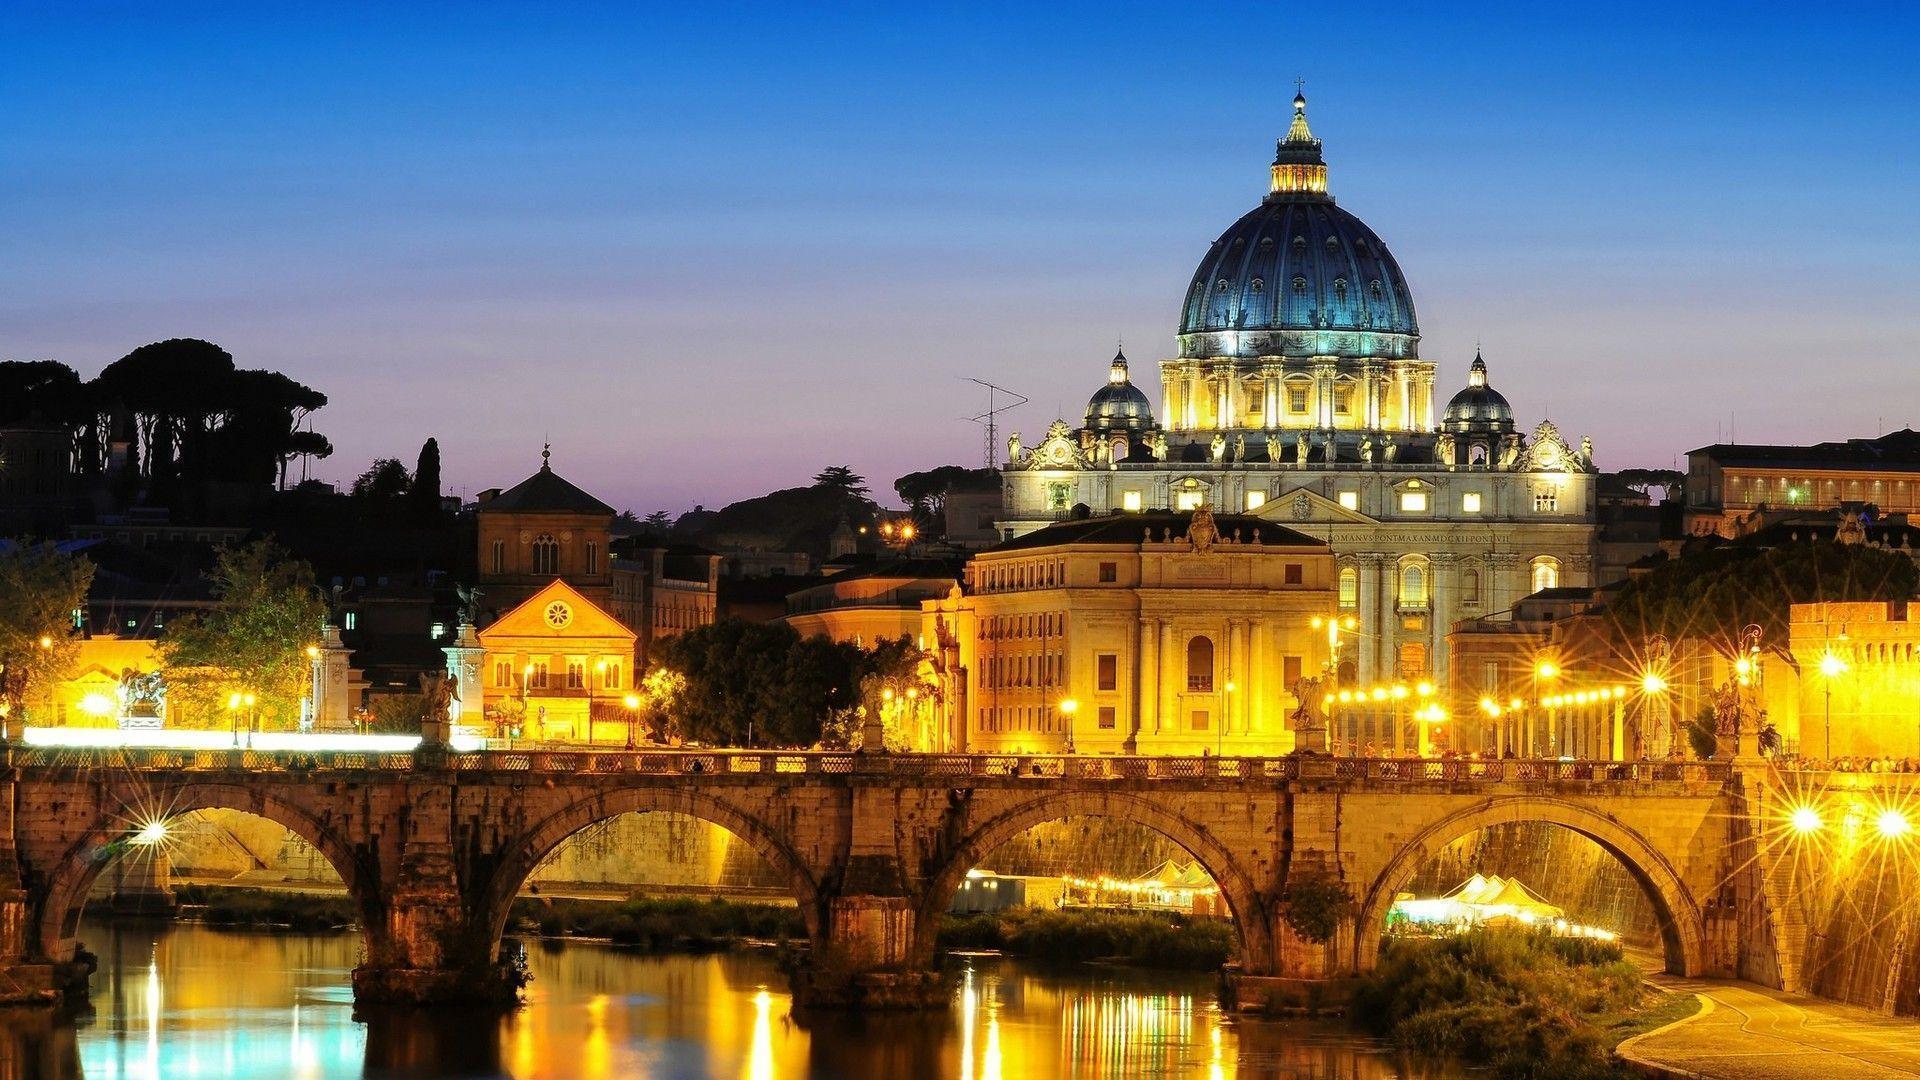 Roma italia wallpaper | AllWallpaper.in #11371 | PC | en